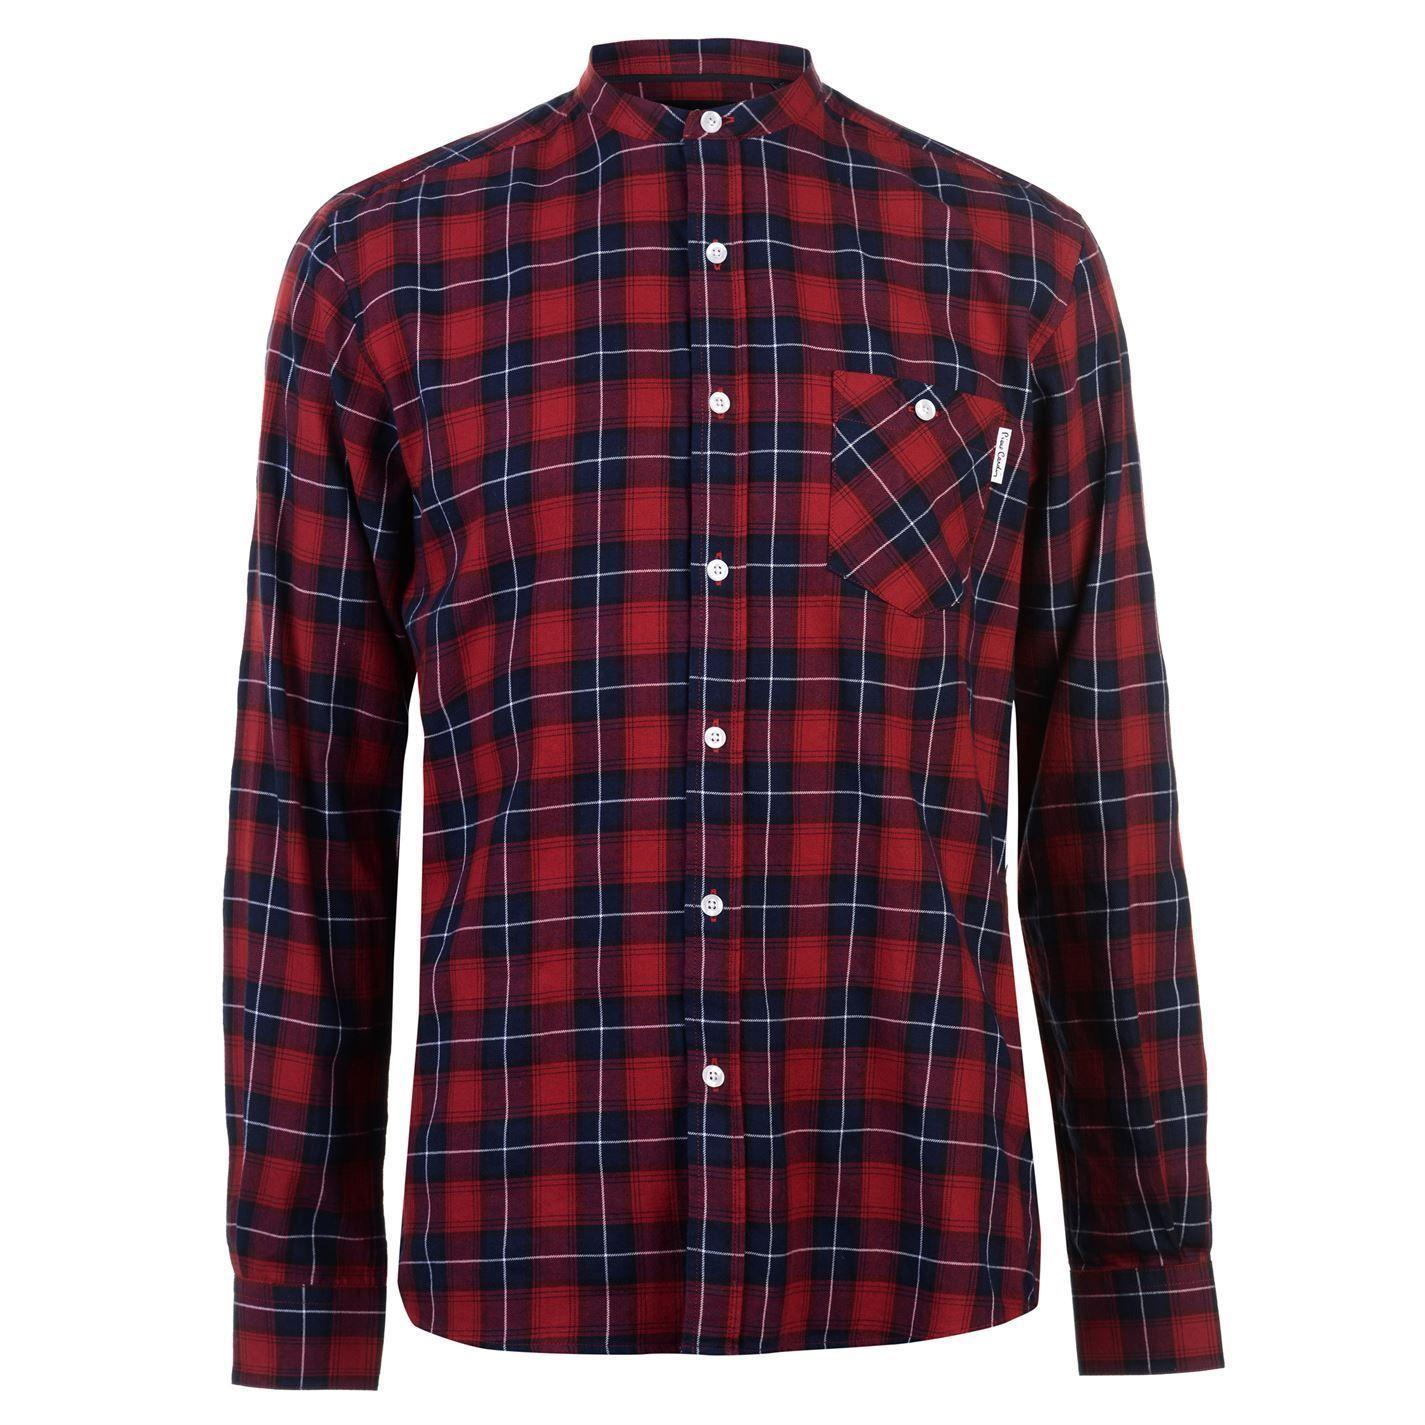 Mandarin collar flannel  Pierre Automobiledin Grandad Collar Flannel Check Shirt Mens Gents